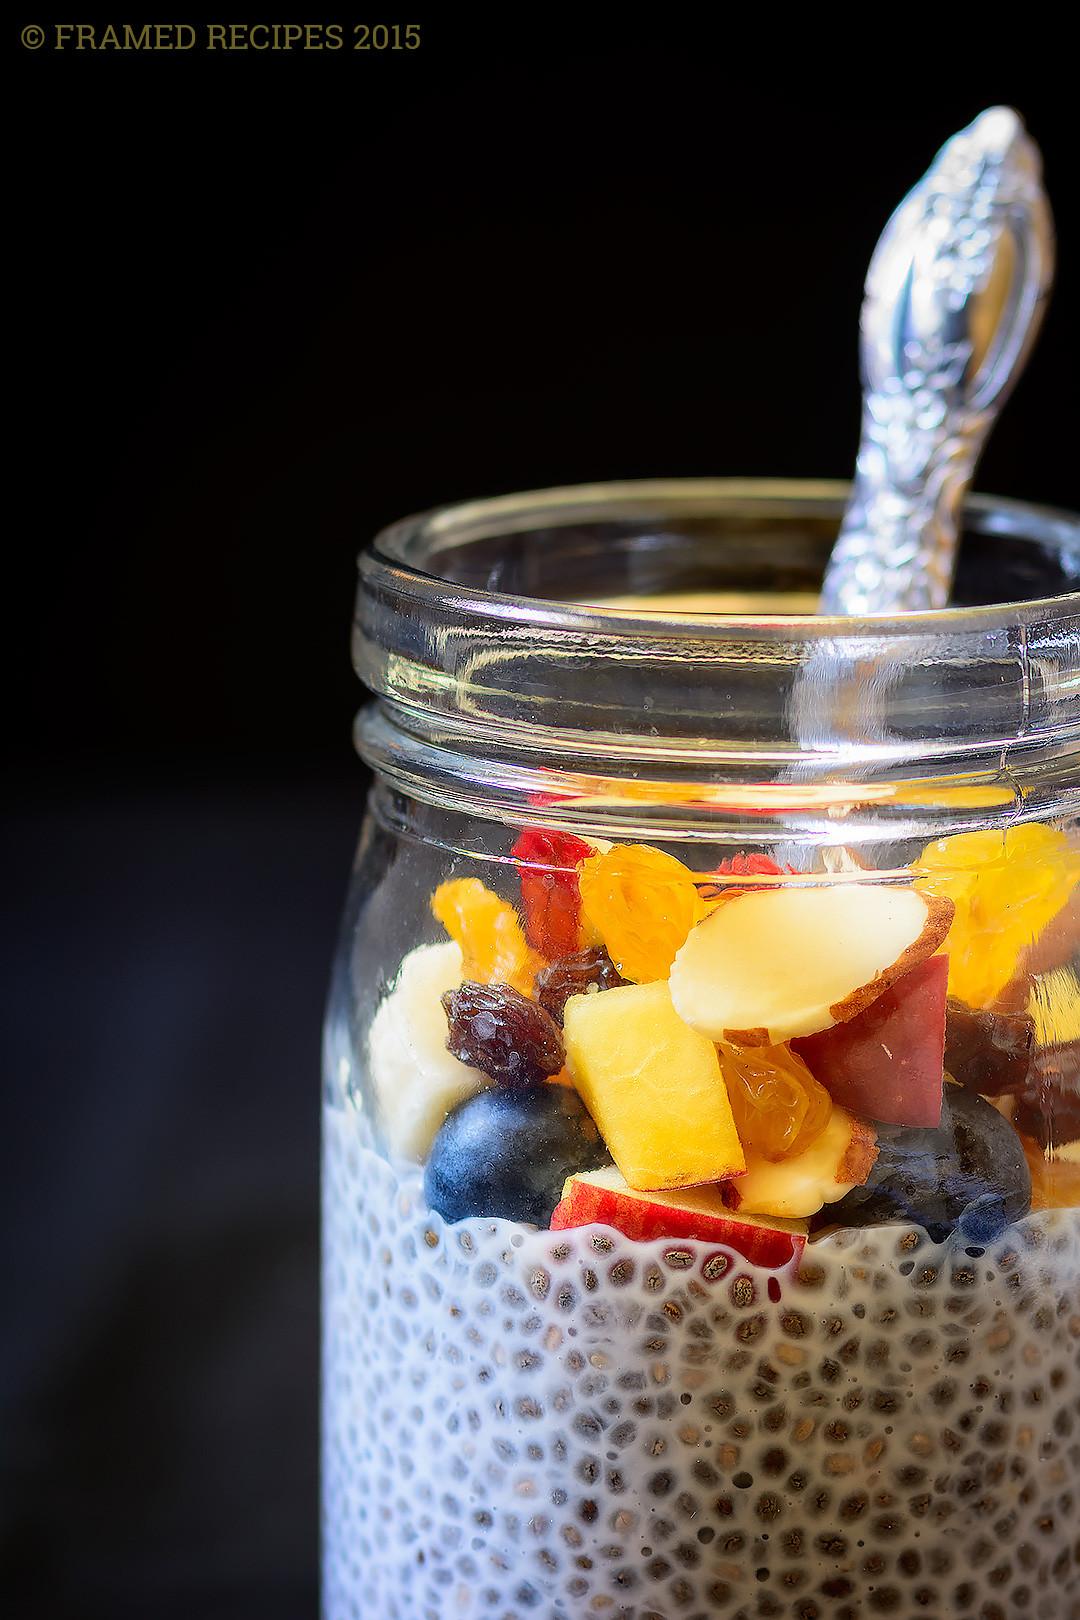 Chia Seed Breakfast Recipes  Chia Seeds Breakfast Bowl Framed Recipes